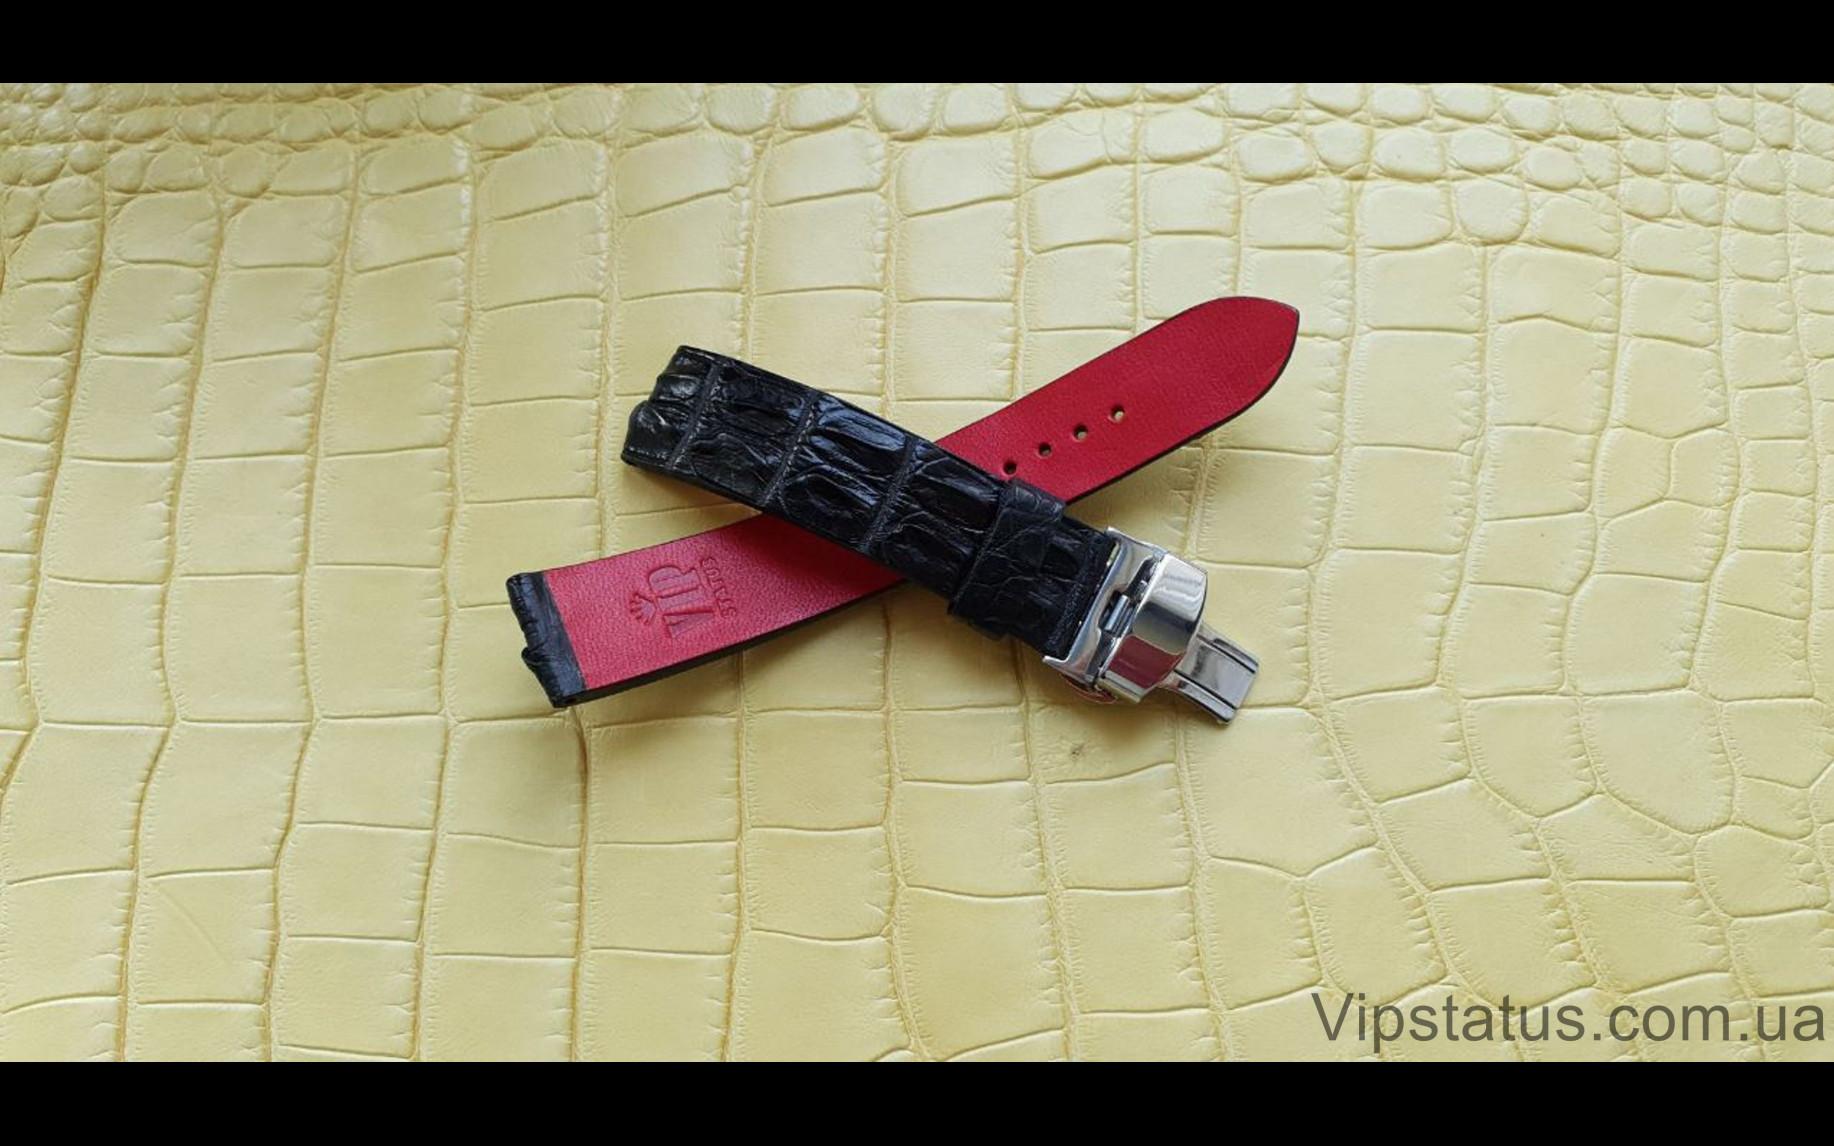 Elite Премиум ремешок для часов Blancpain кожа крокодила Premium Crocodile Strap for Blancpain watches image 1